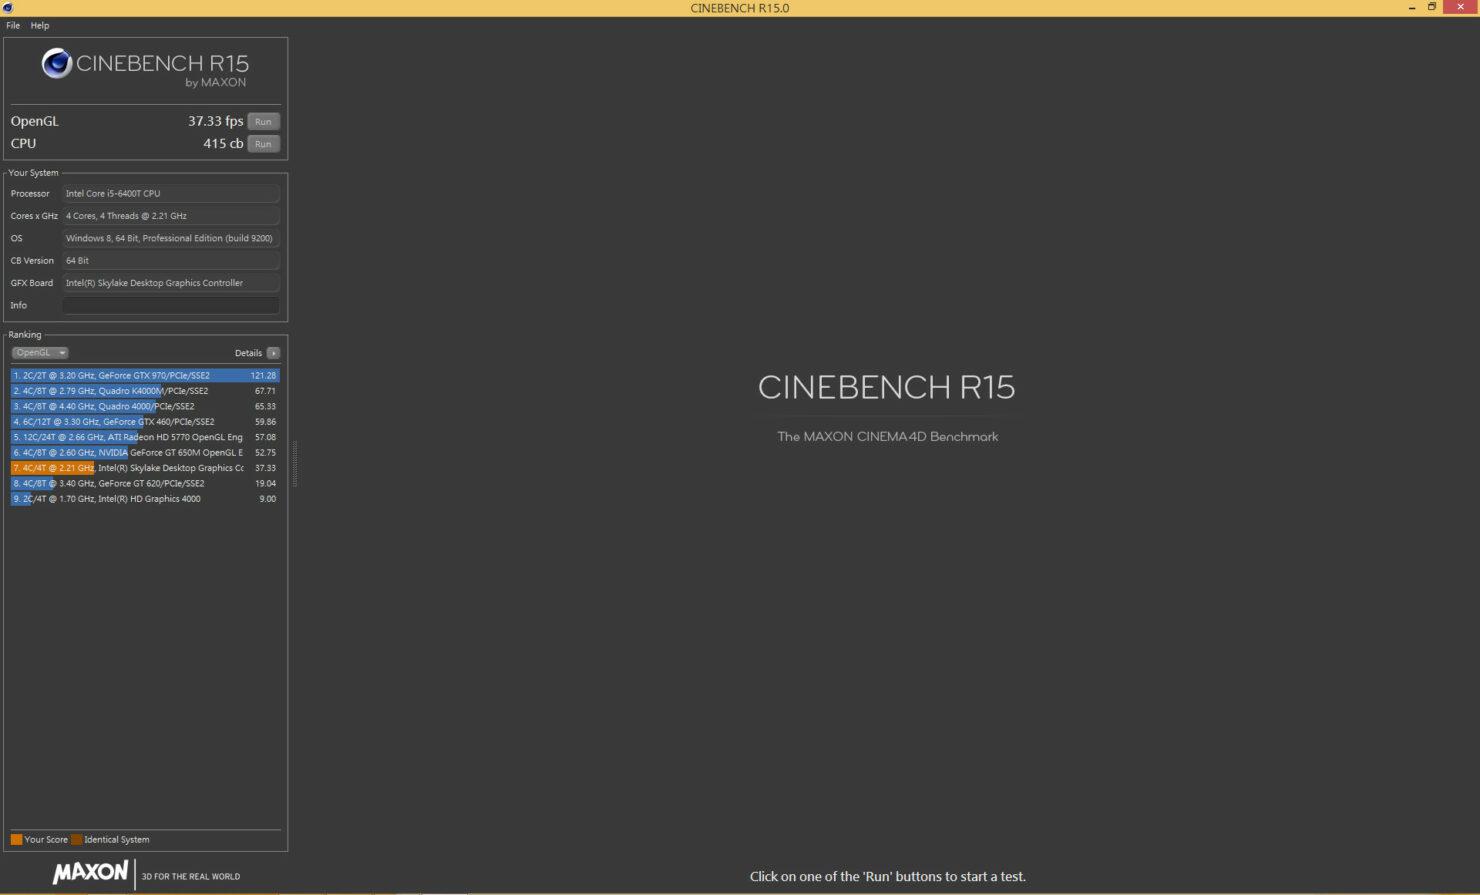 skylake-core-i5-6400t_cinebench-r15